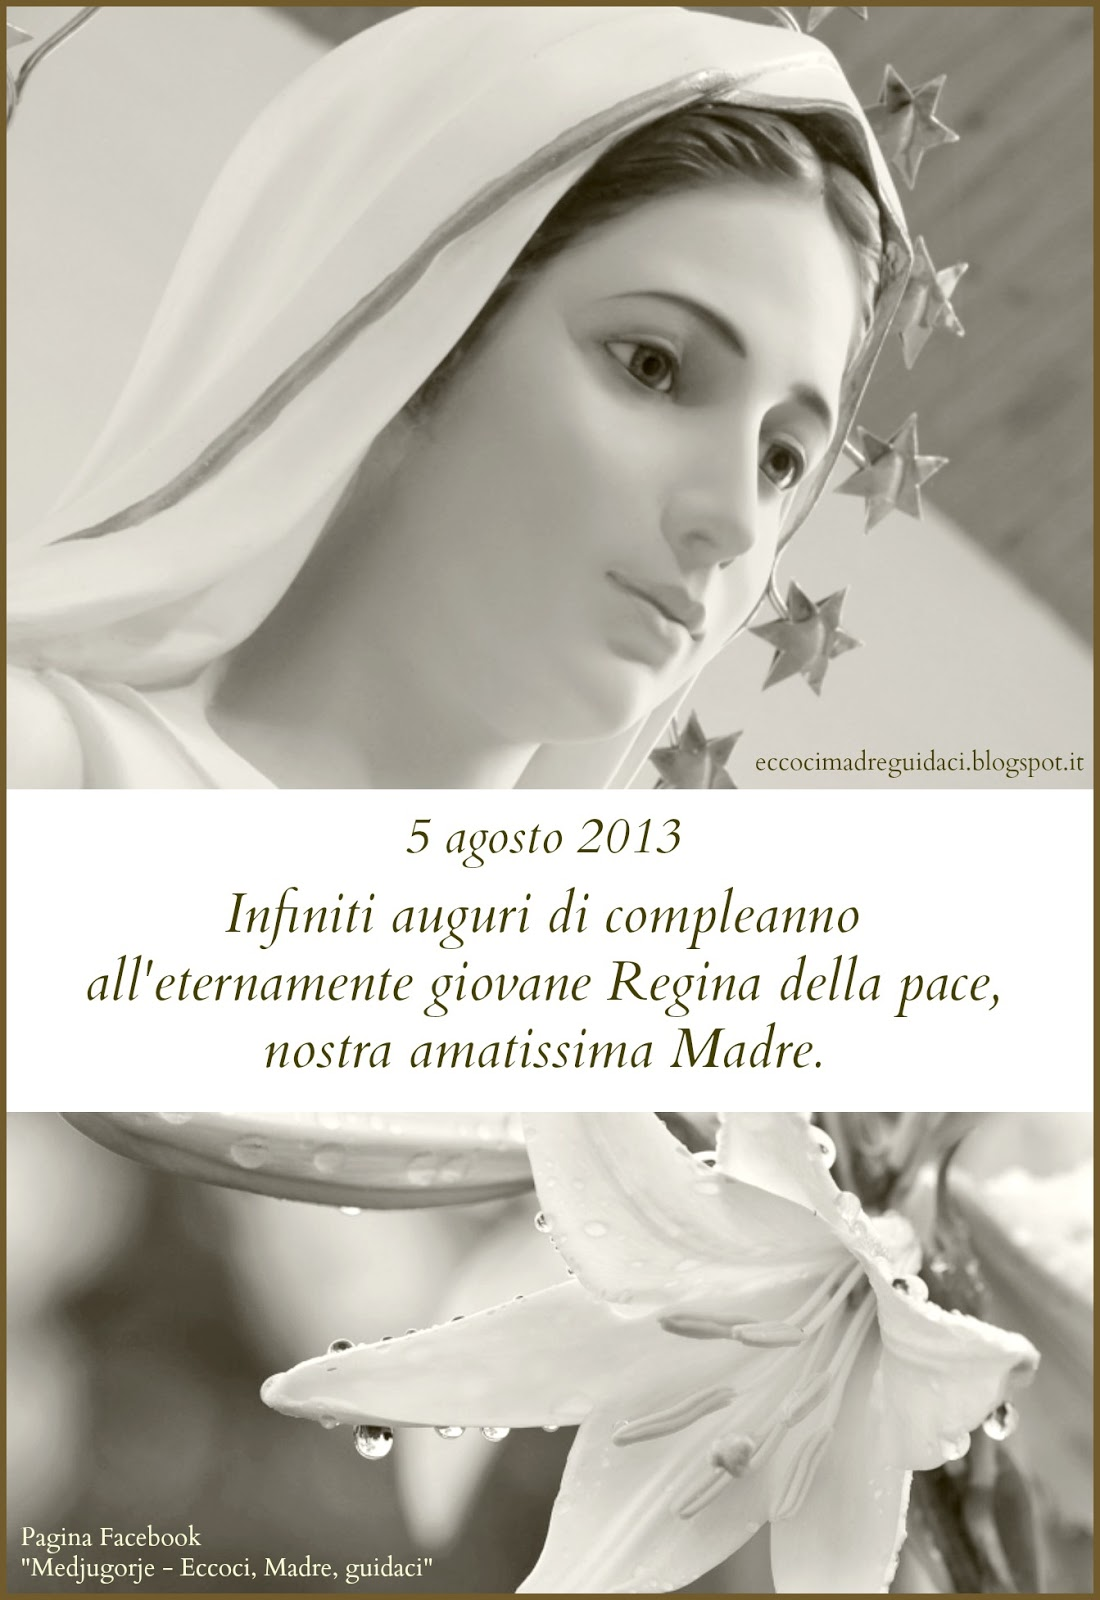 Matrimonio Auguri Religiosi : Auguri di buon compleanno religiosi cy regardsdefemmes